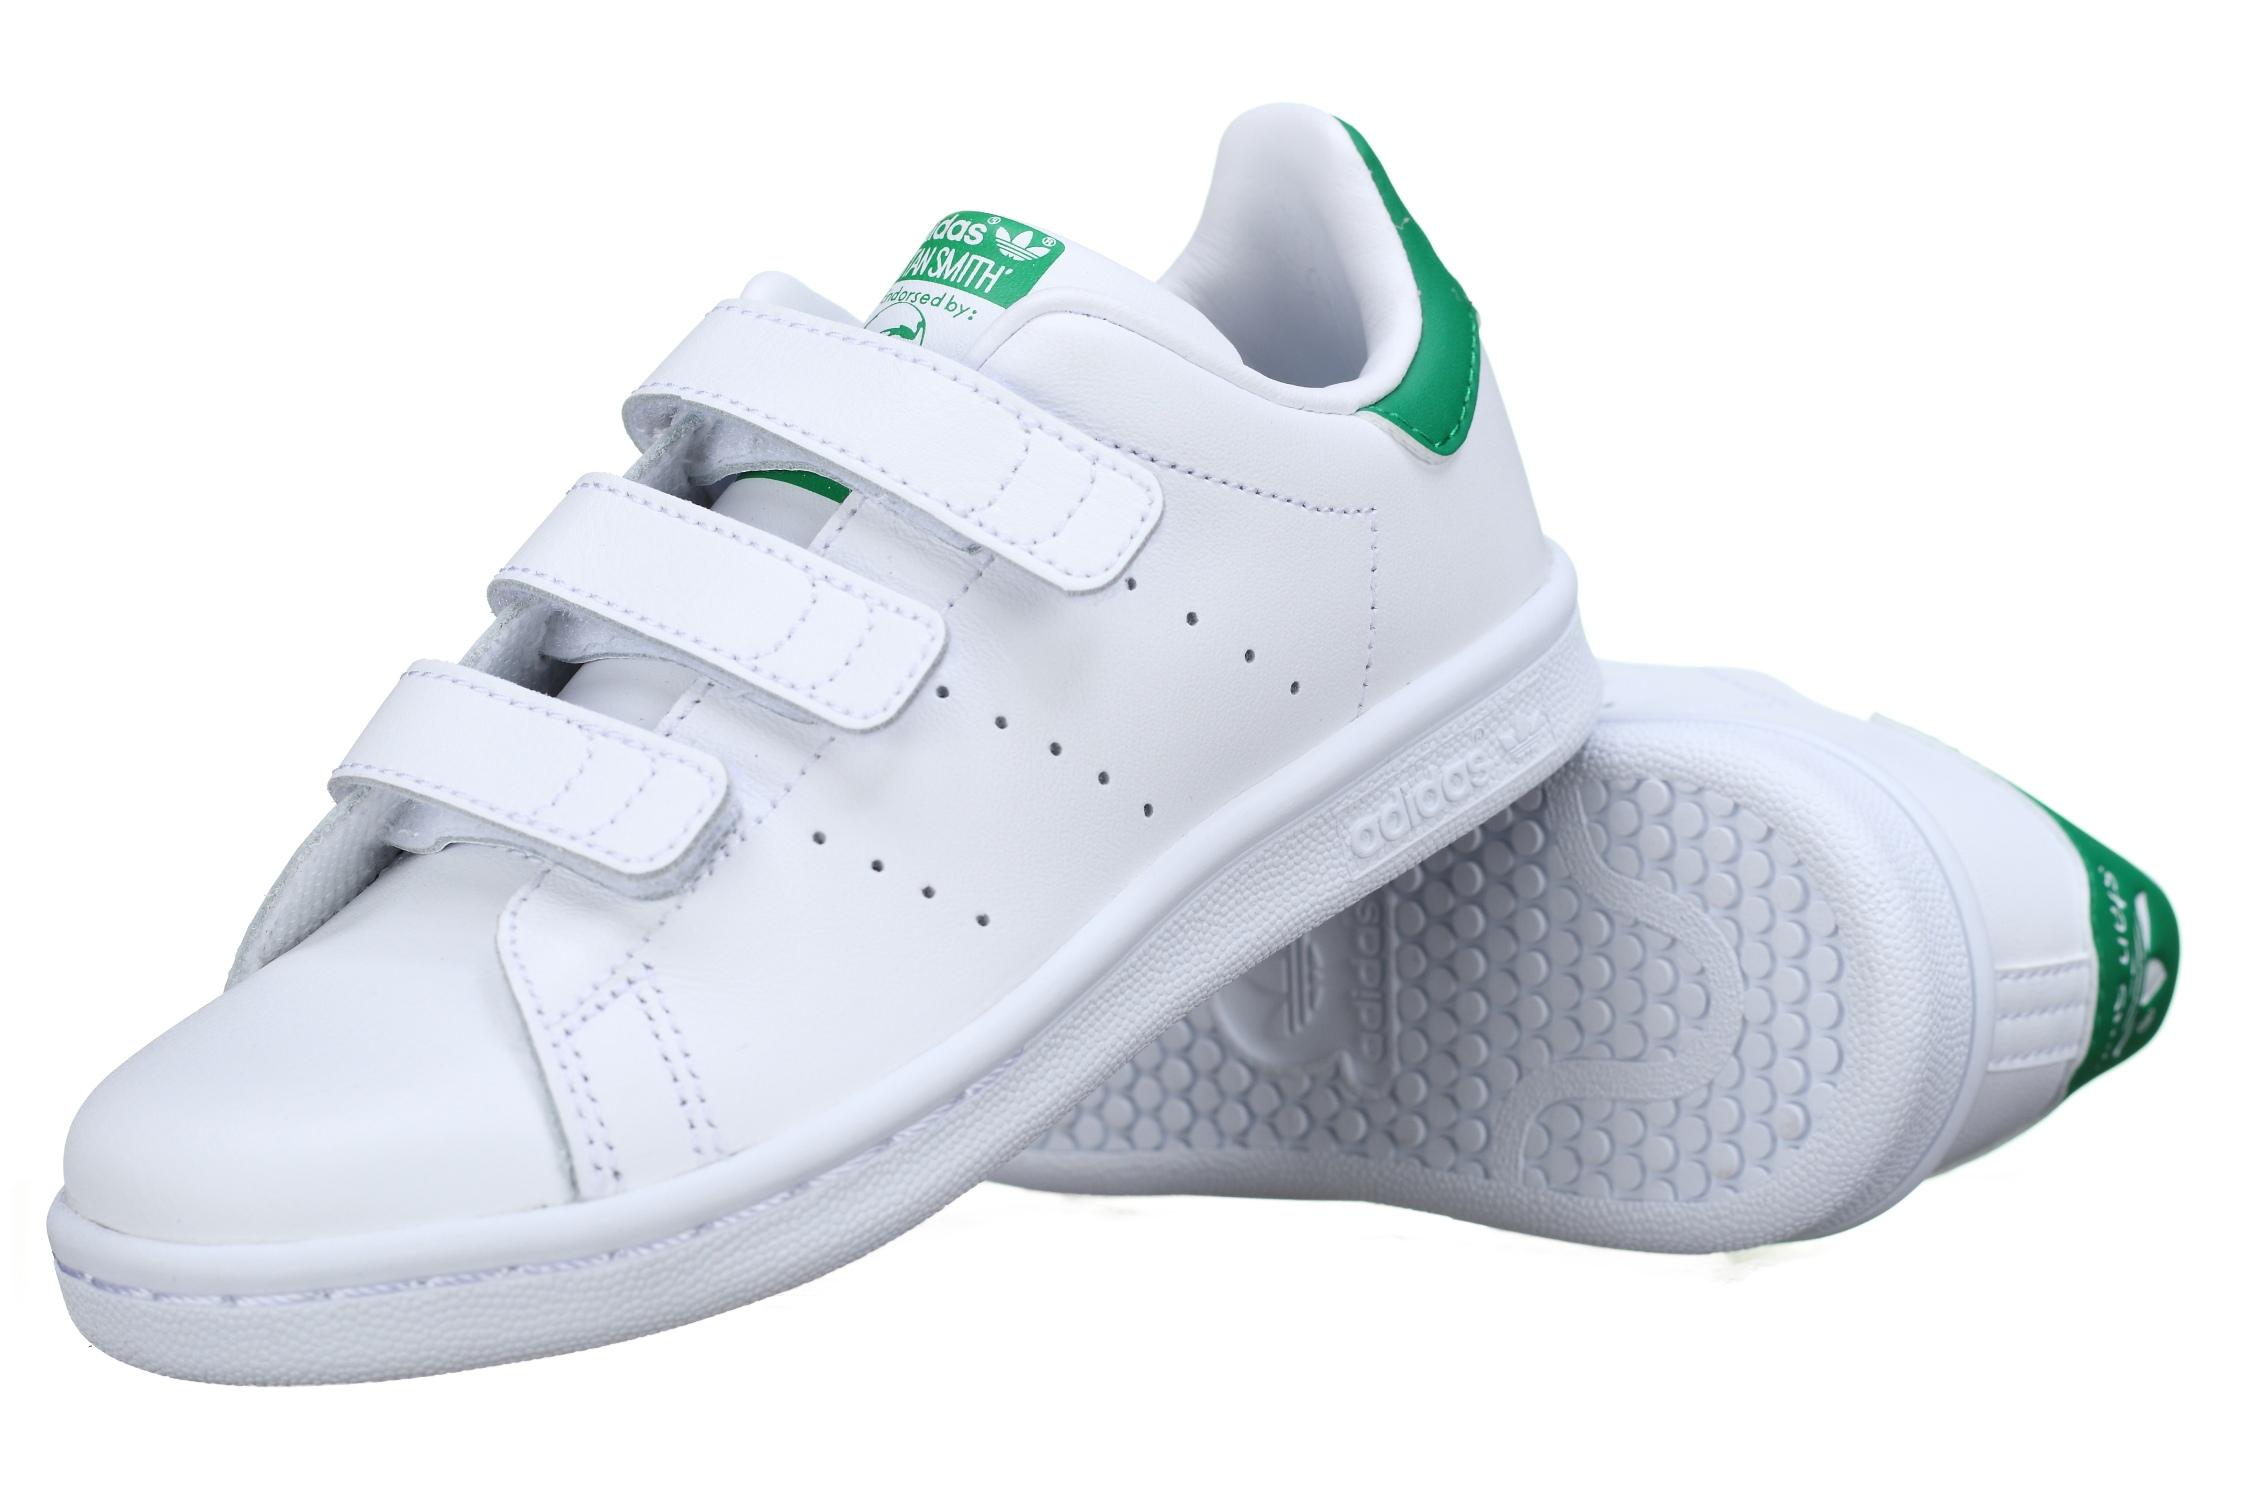 http://www.leadermode.com/137722/adidas-stan-smith-cf-c-m20607-blanc-vert.jpg